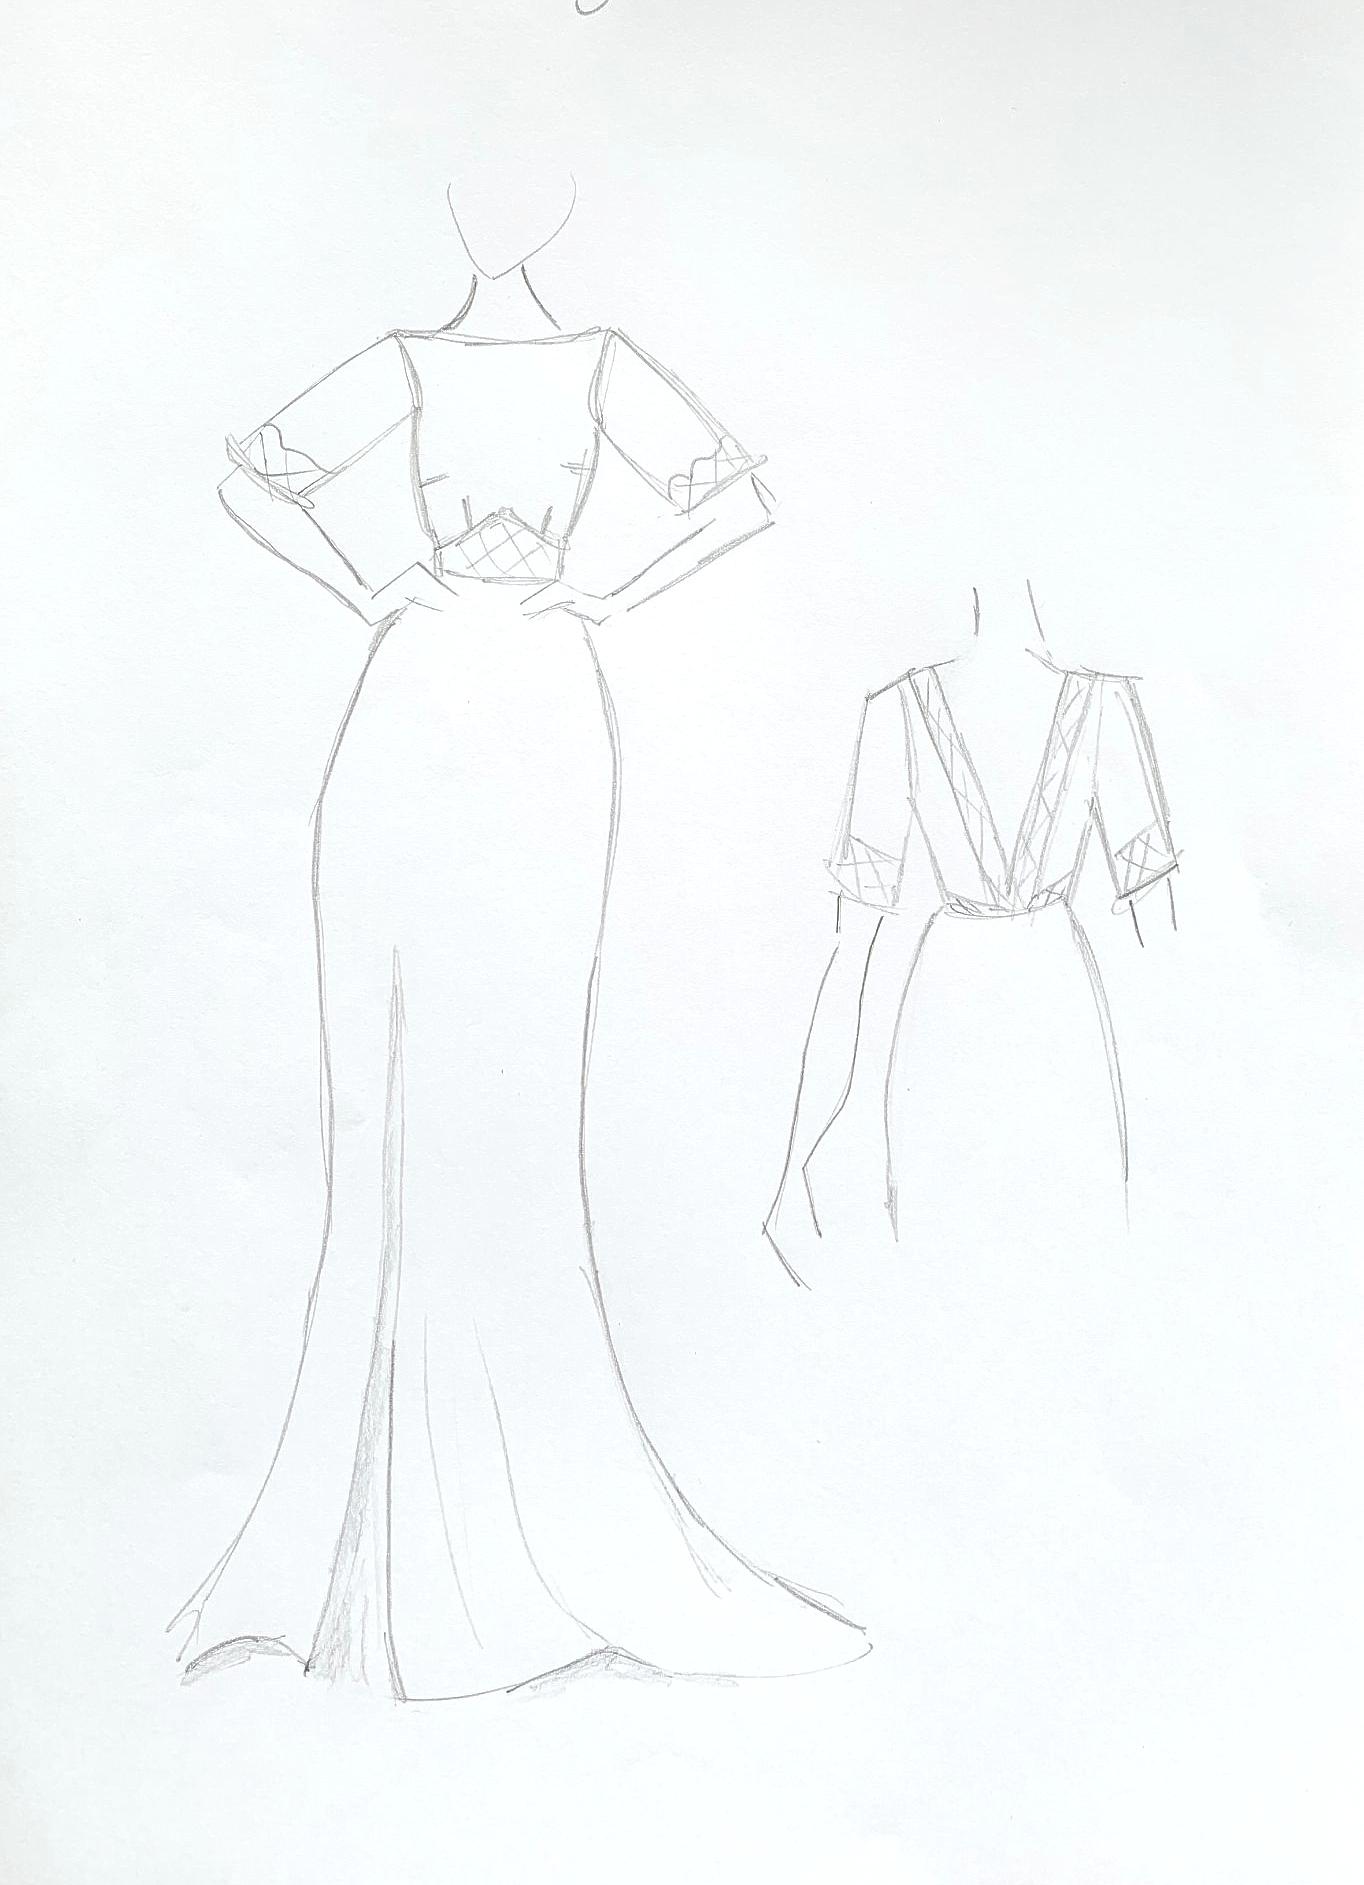 bespoke wedding dresss sketch